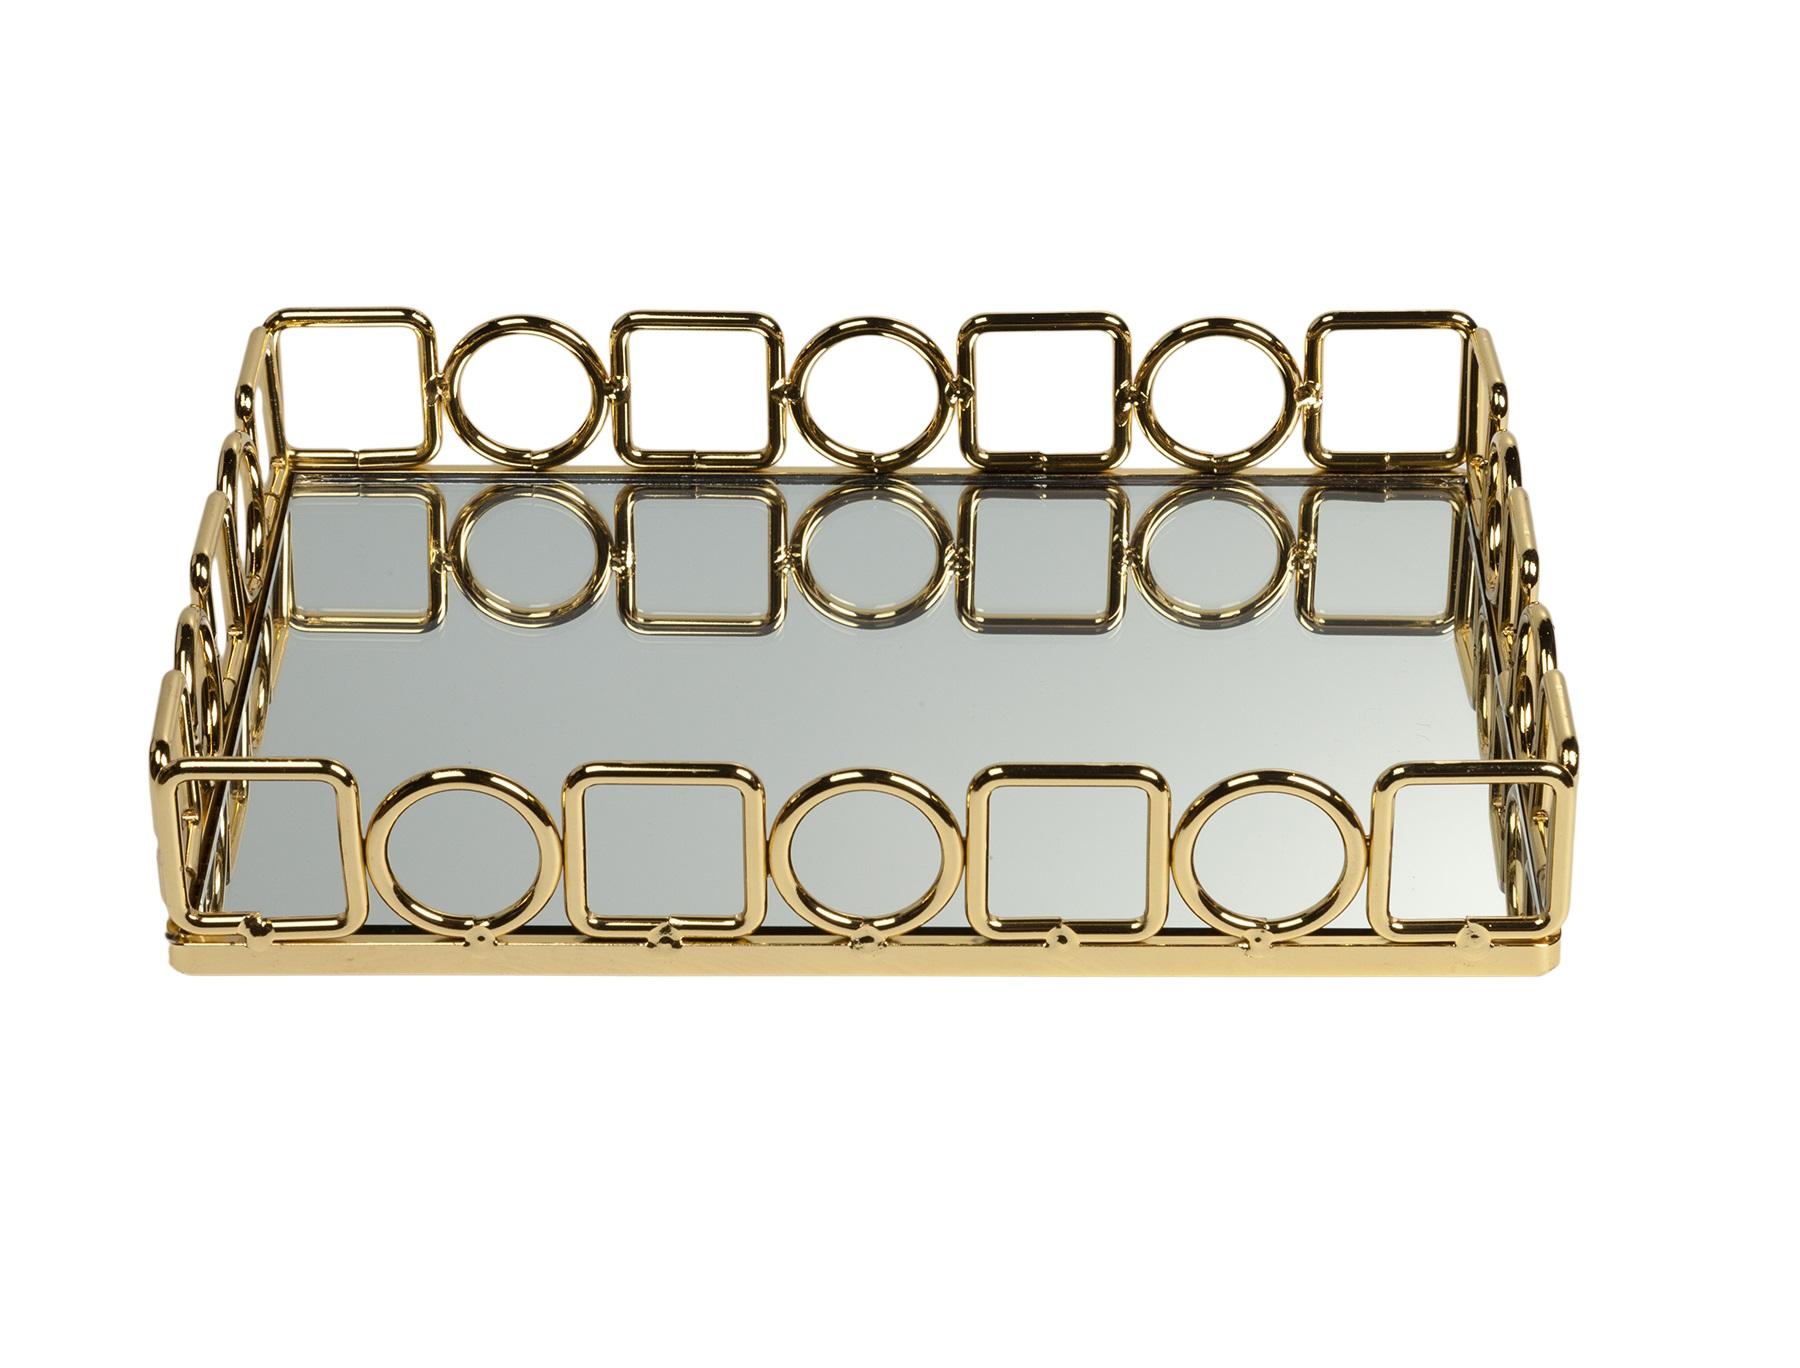 Зеркальный поднос DebraДекоративные подносы<br>Материал: Металл, Зеркало<br><br>Material: Металл<br>Length см: None<br>Width см: 29,5<br>Depth см: 22<br>Height см: 5